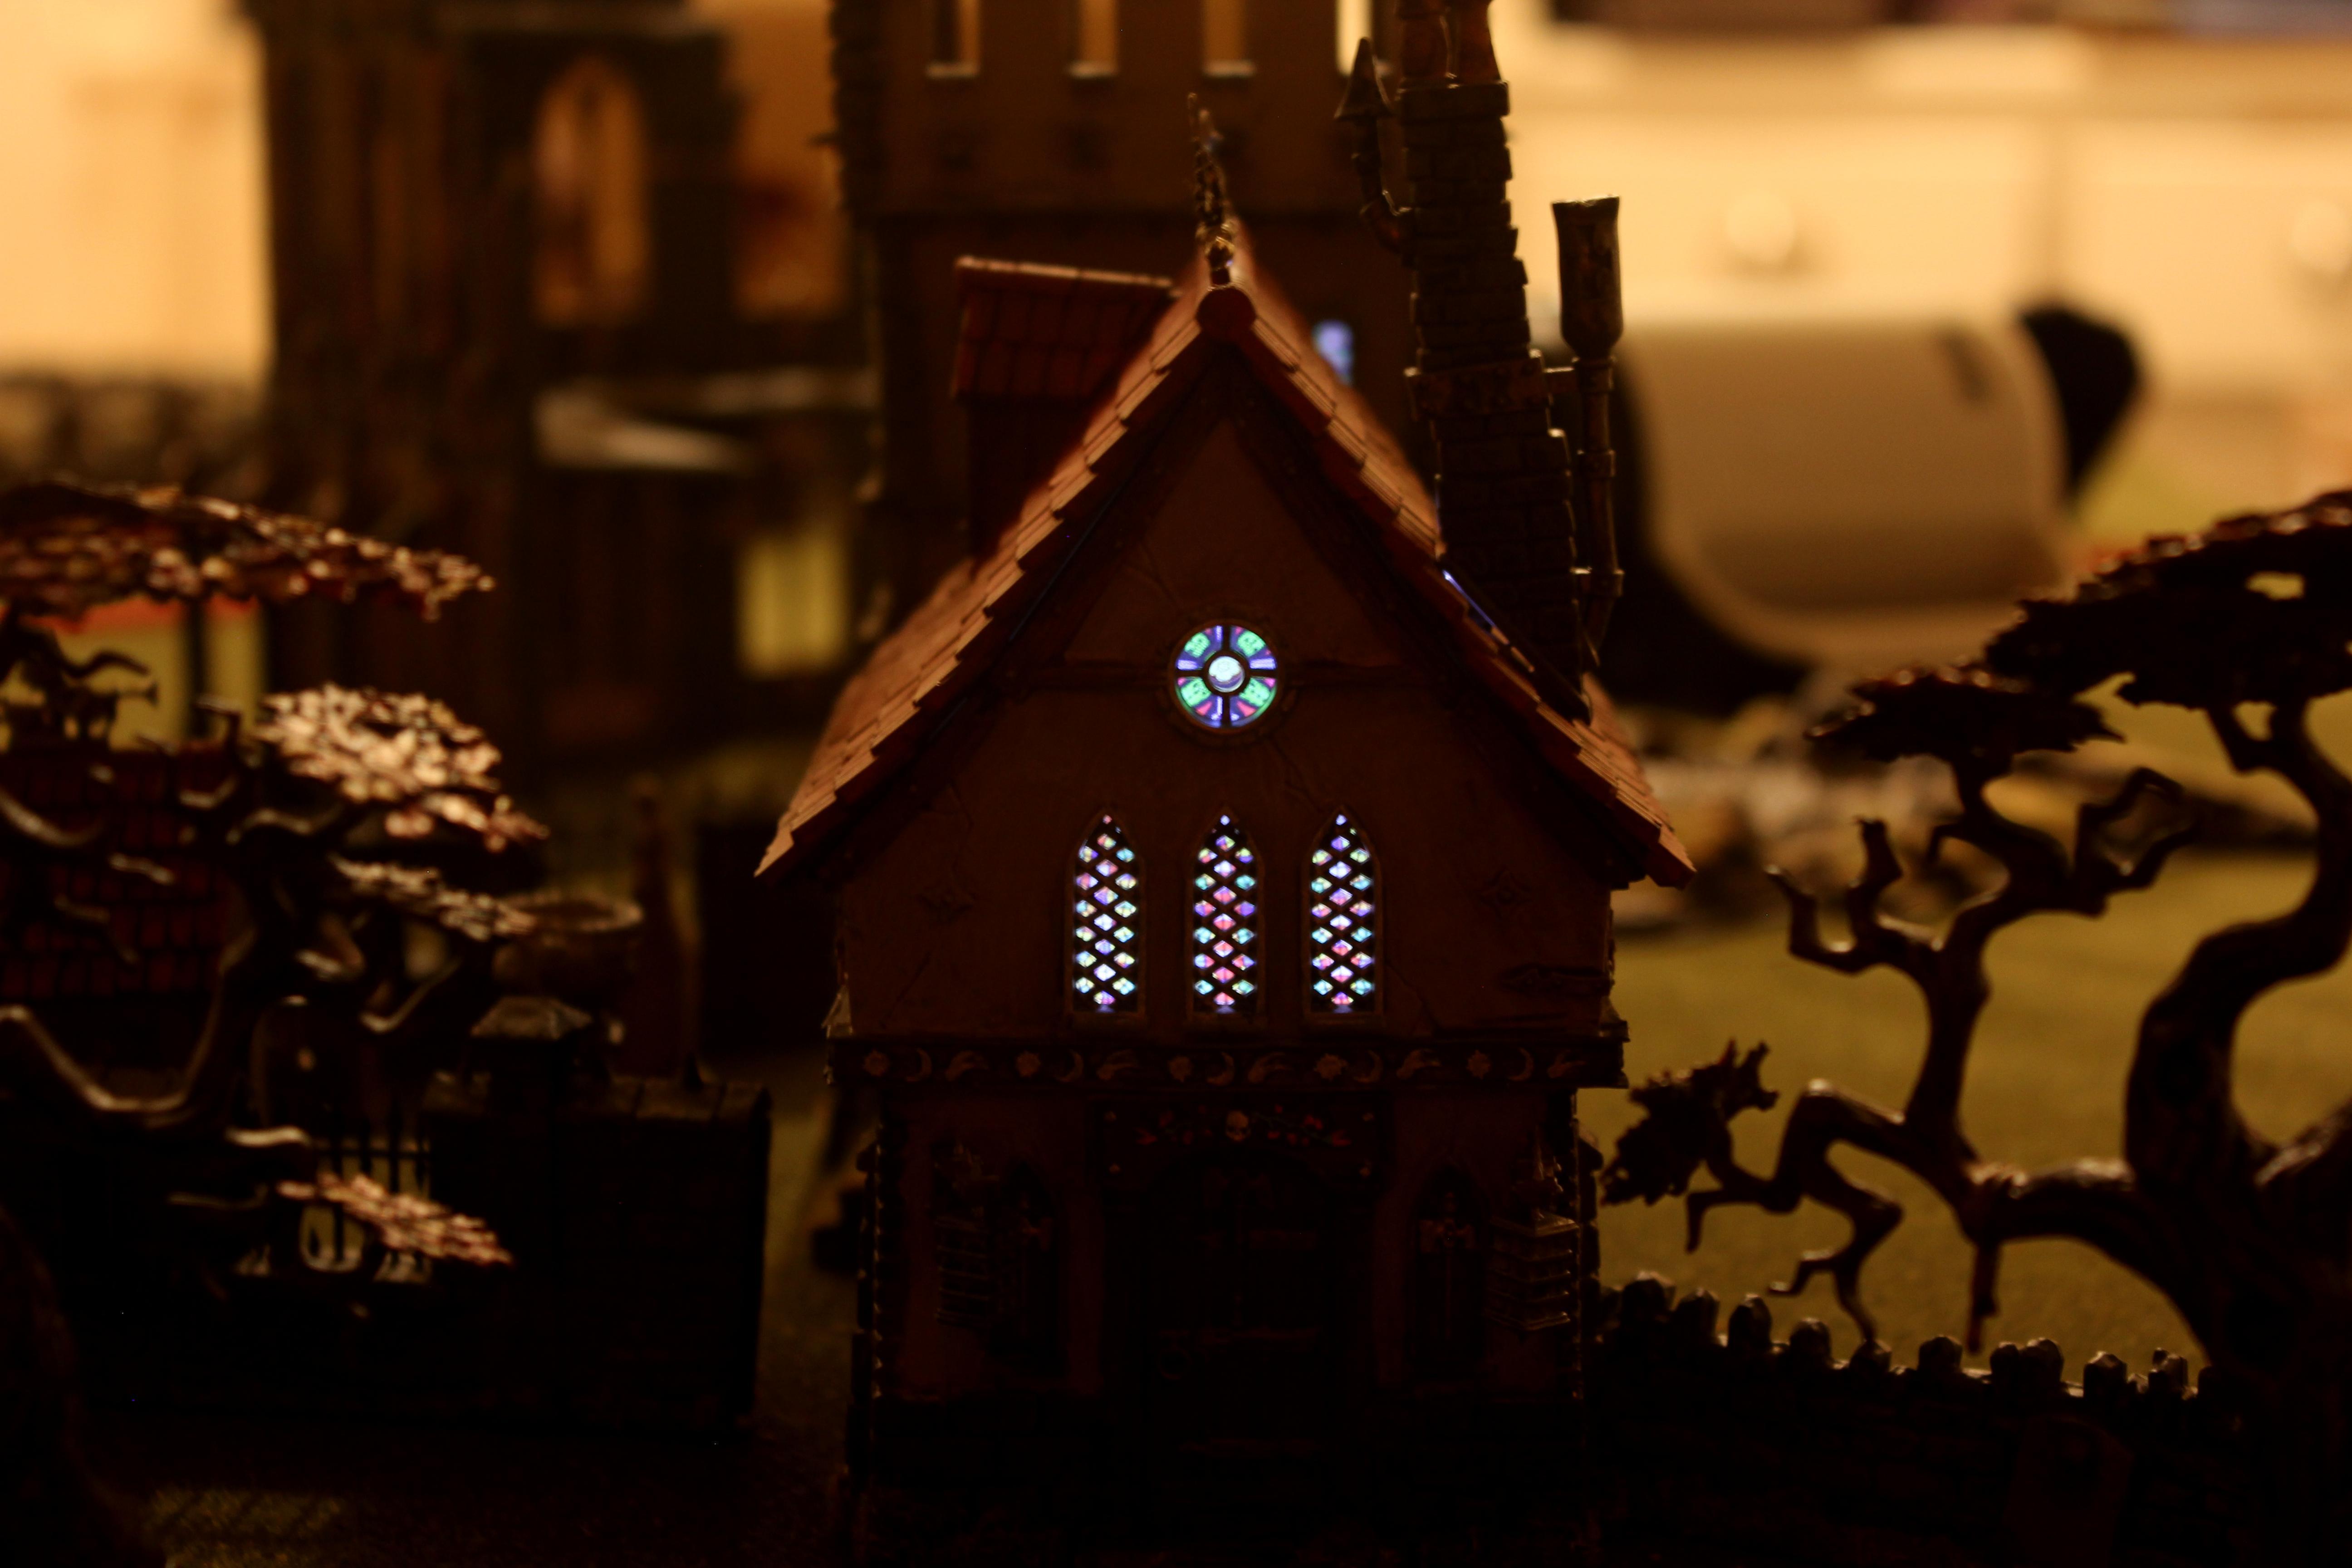 Church, Fortified Manor, Games Workshop, LED, Lights, Terrain, Warhammer Fantasy, Warhammer Terrain